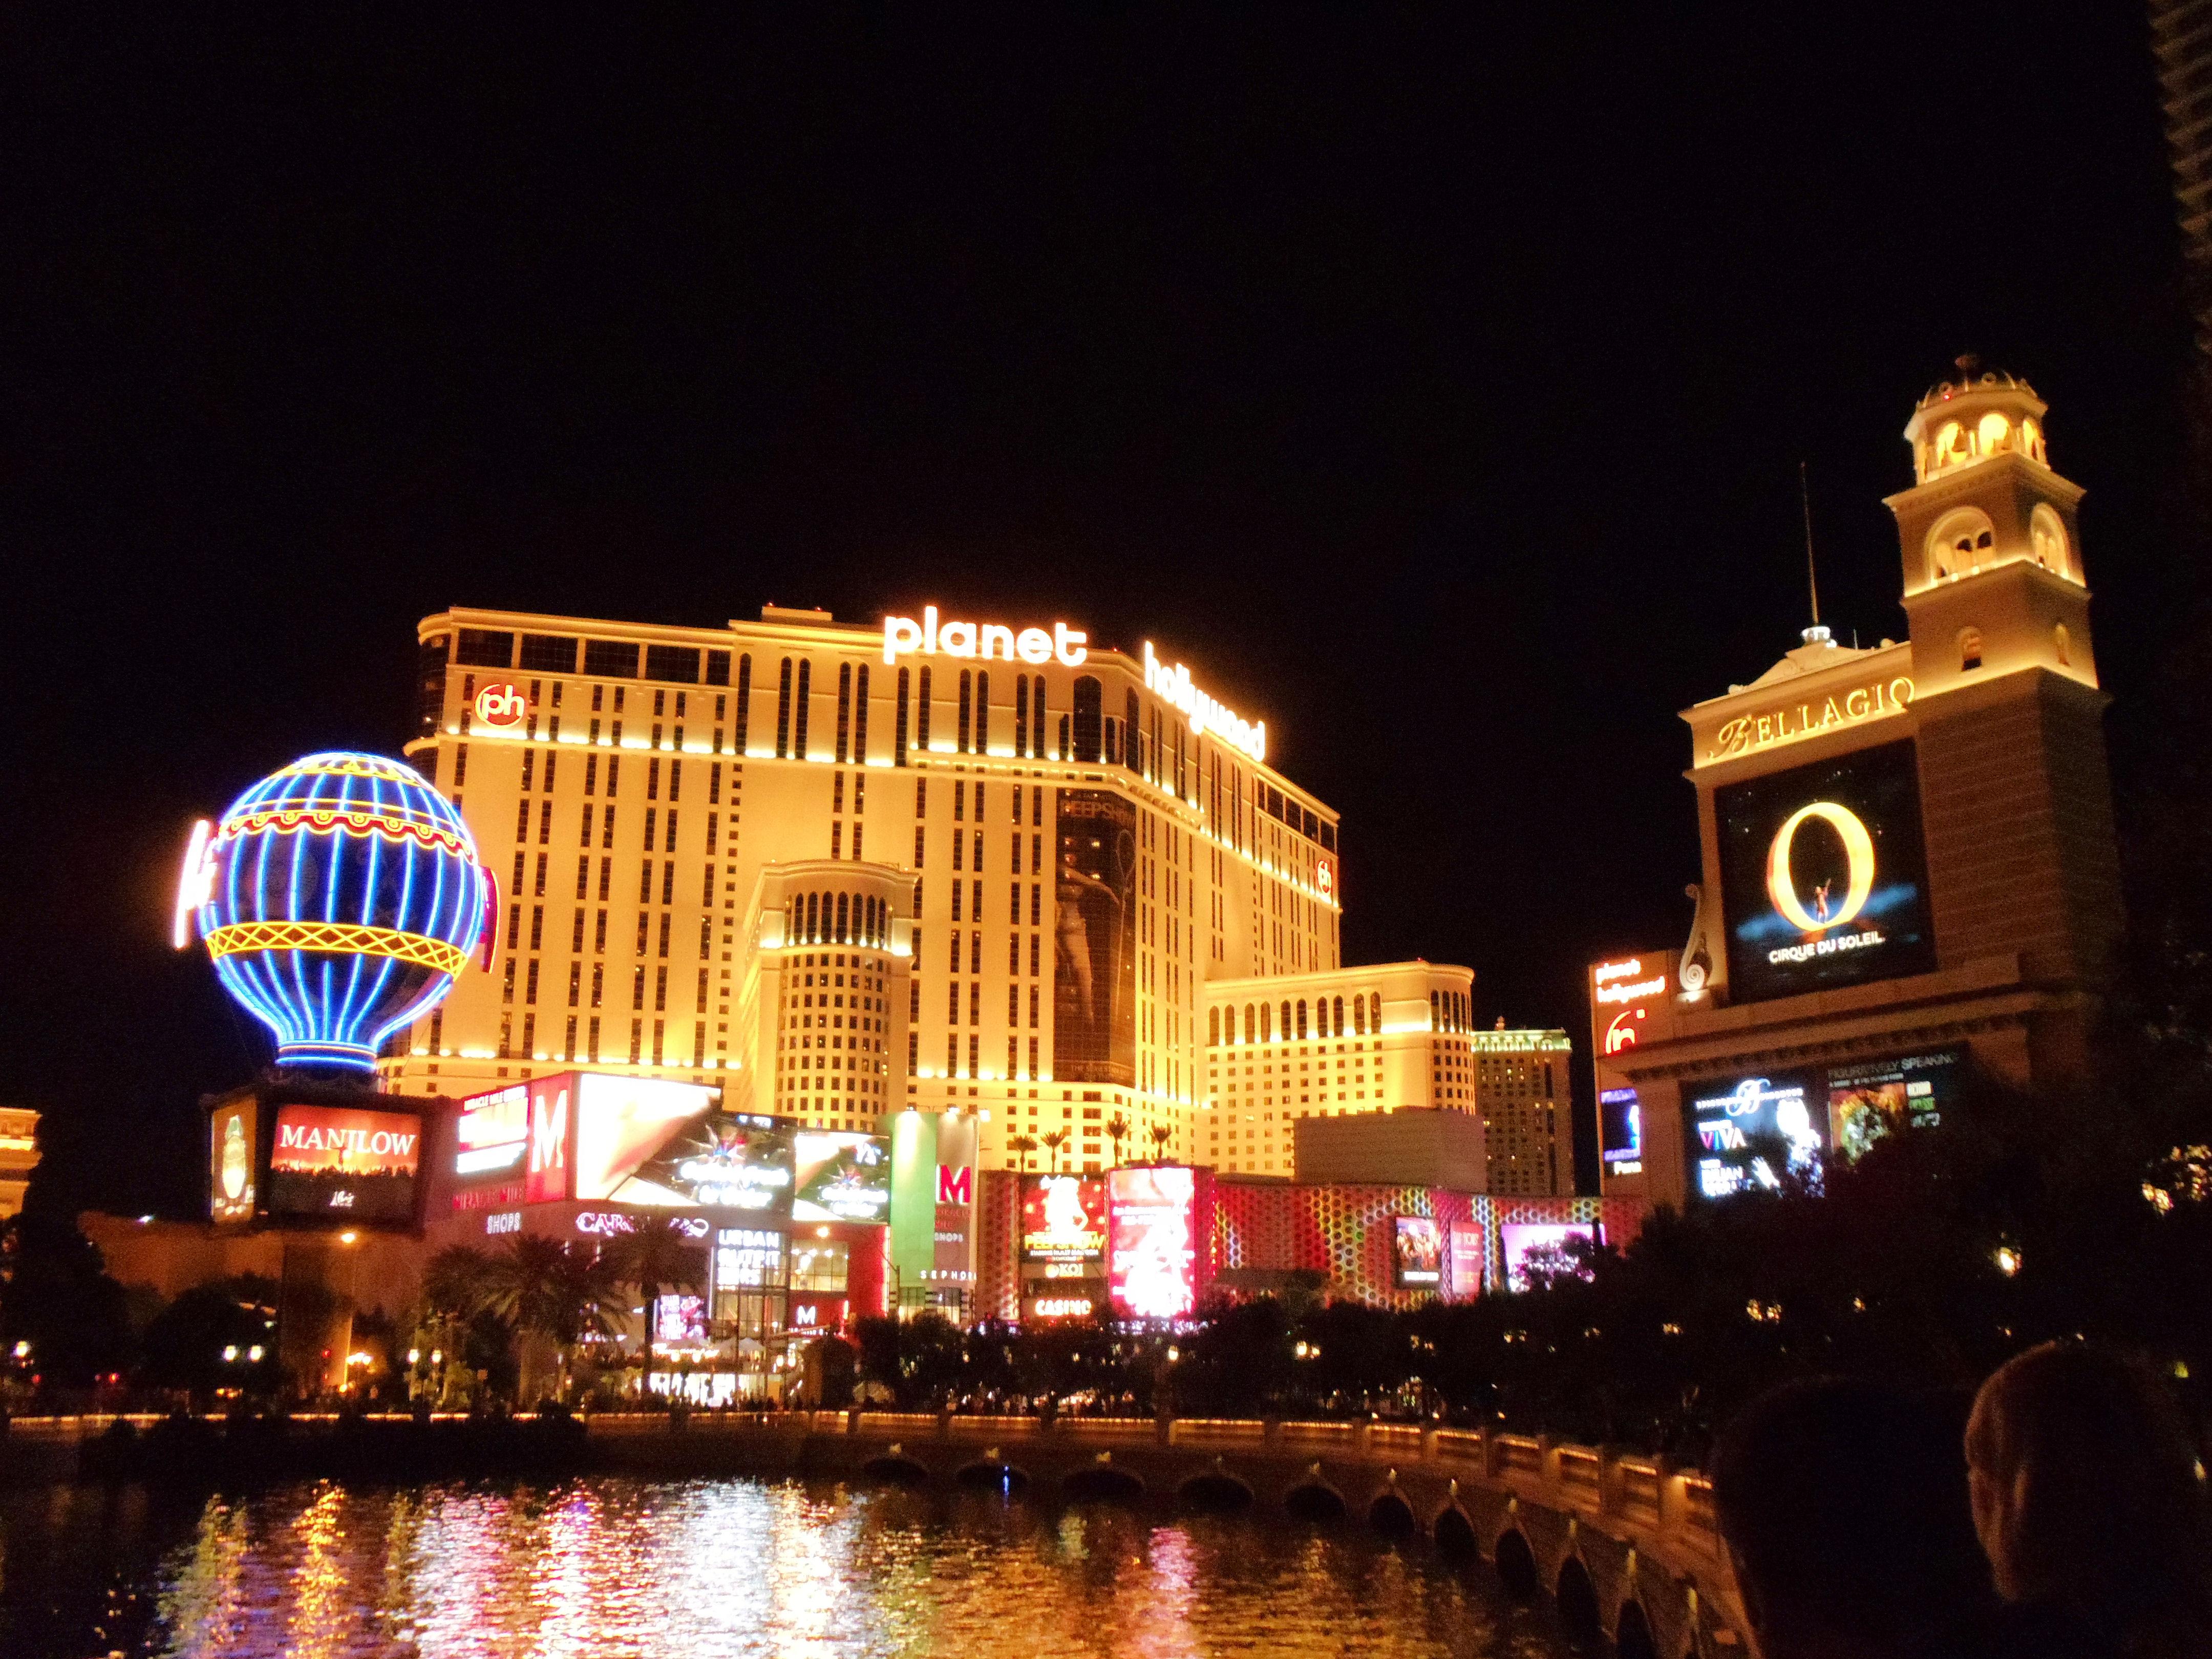 Planet hollywood hotel casino 11